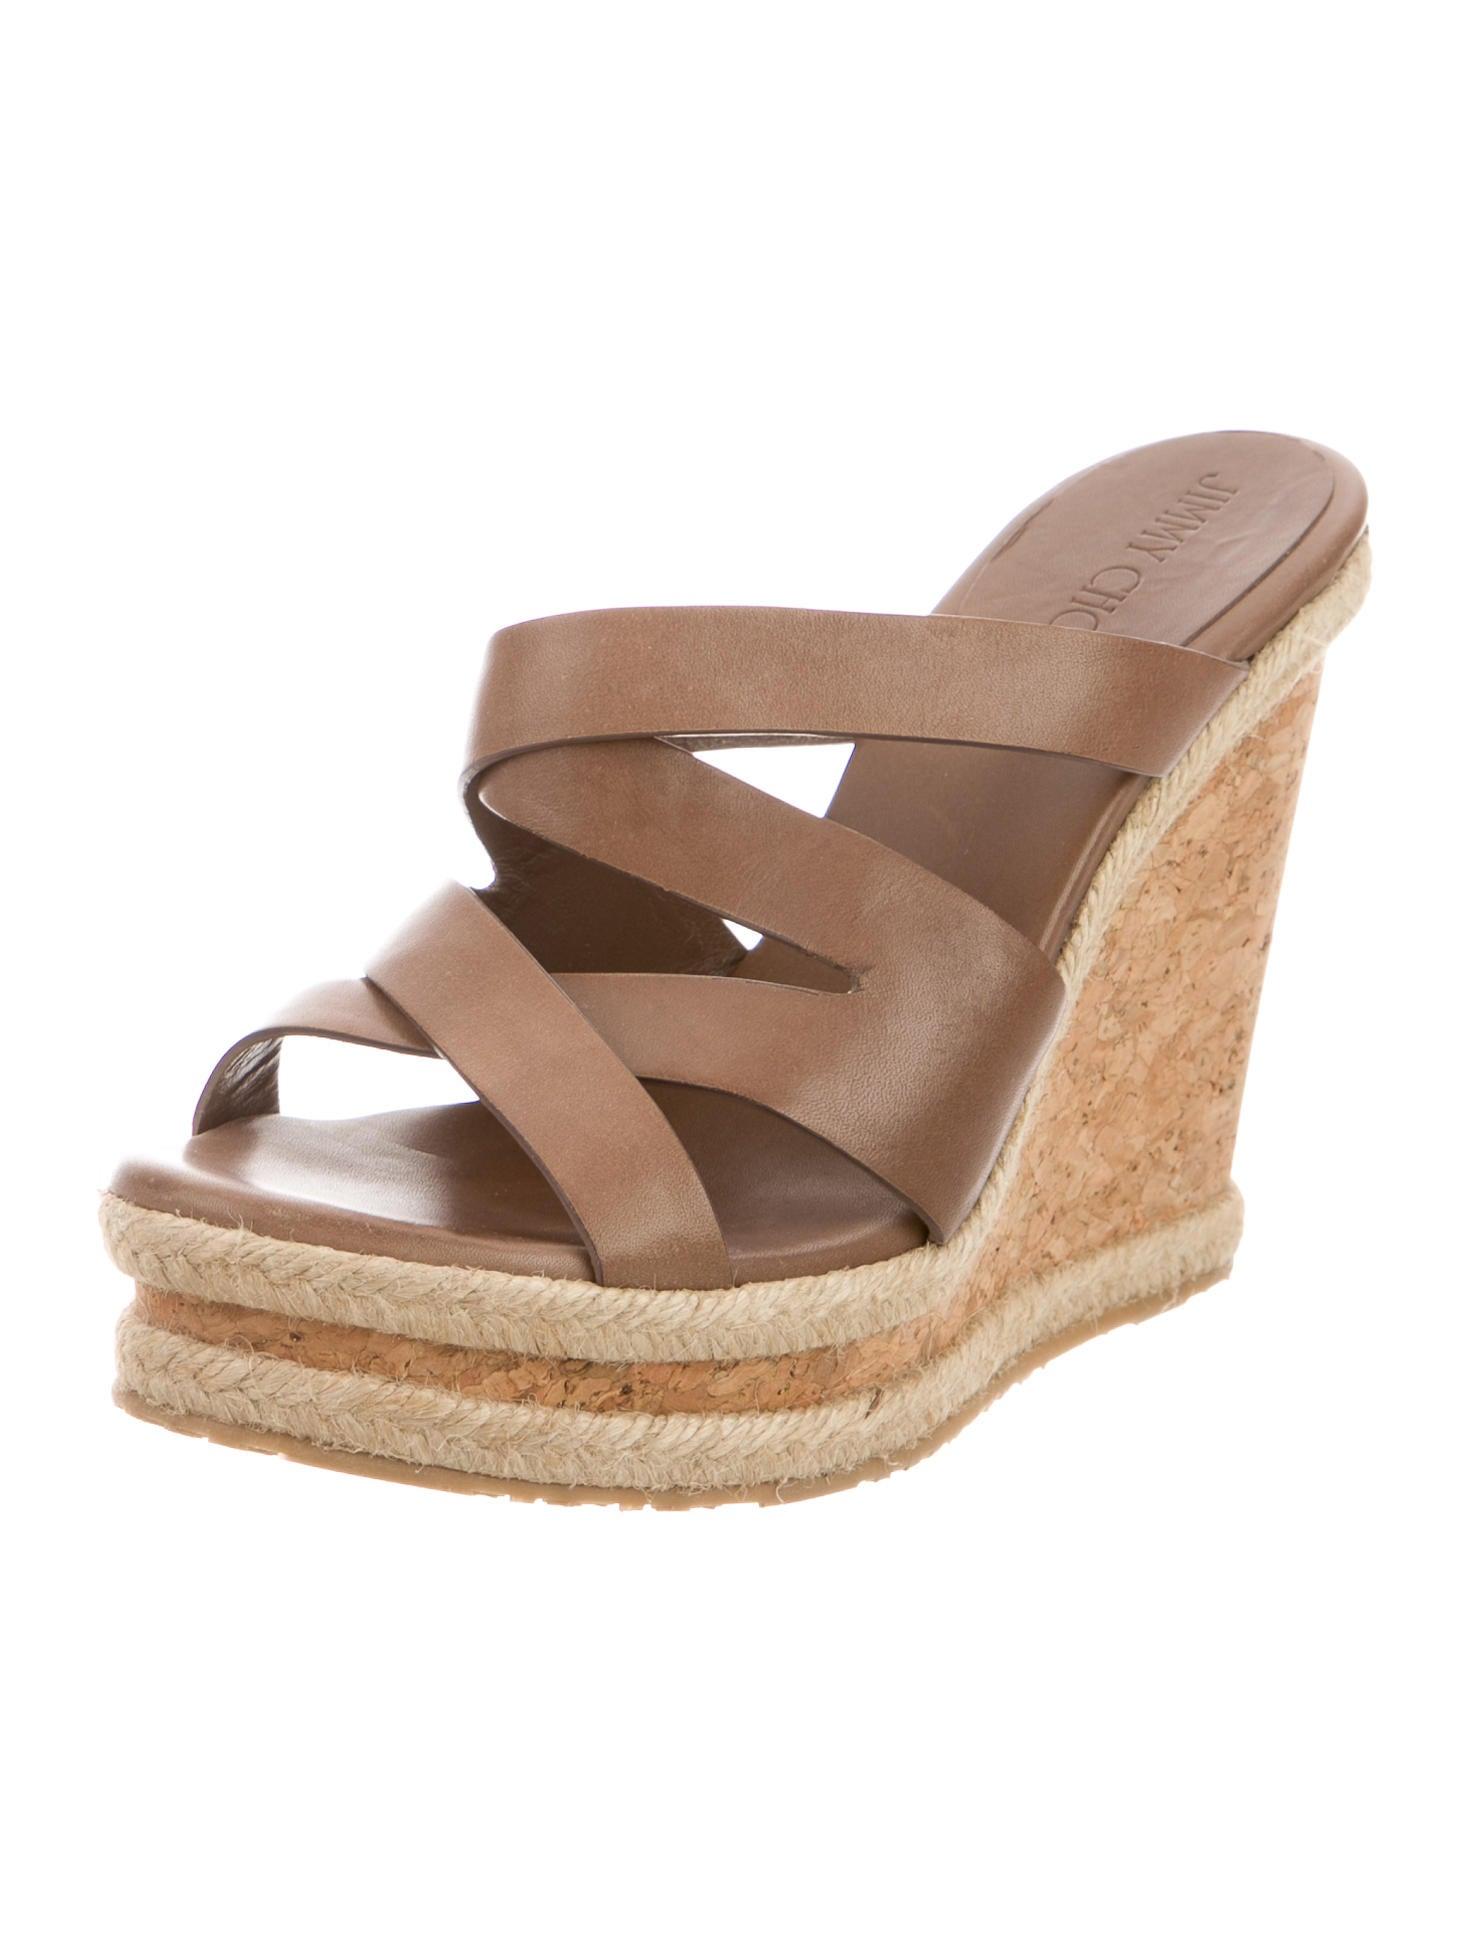 jimmy choo leather platform wedges shoes jim54624